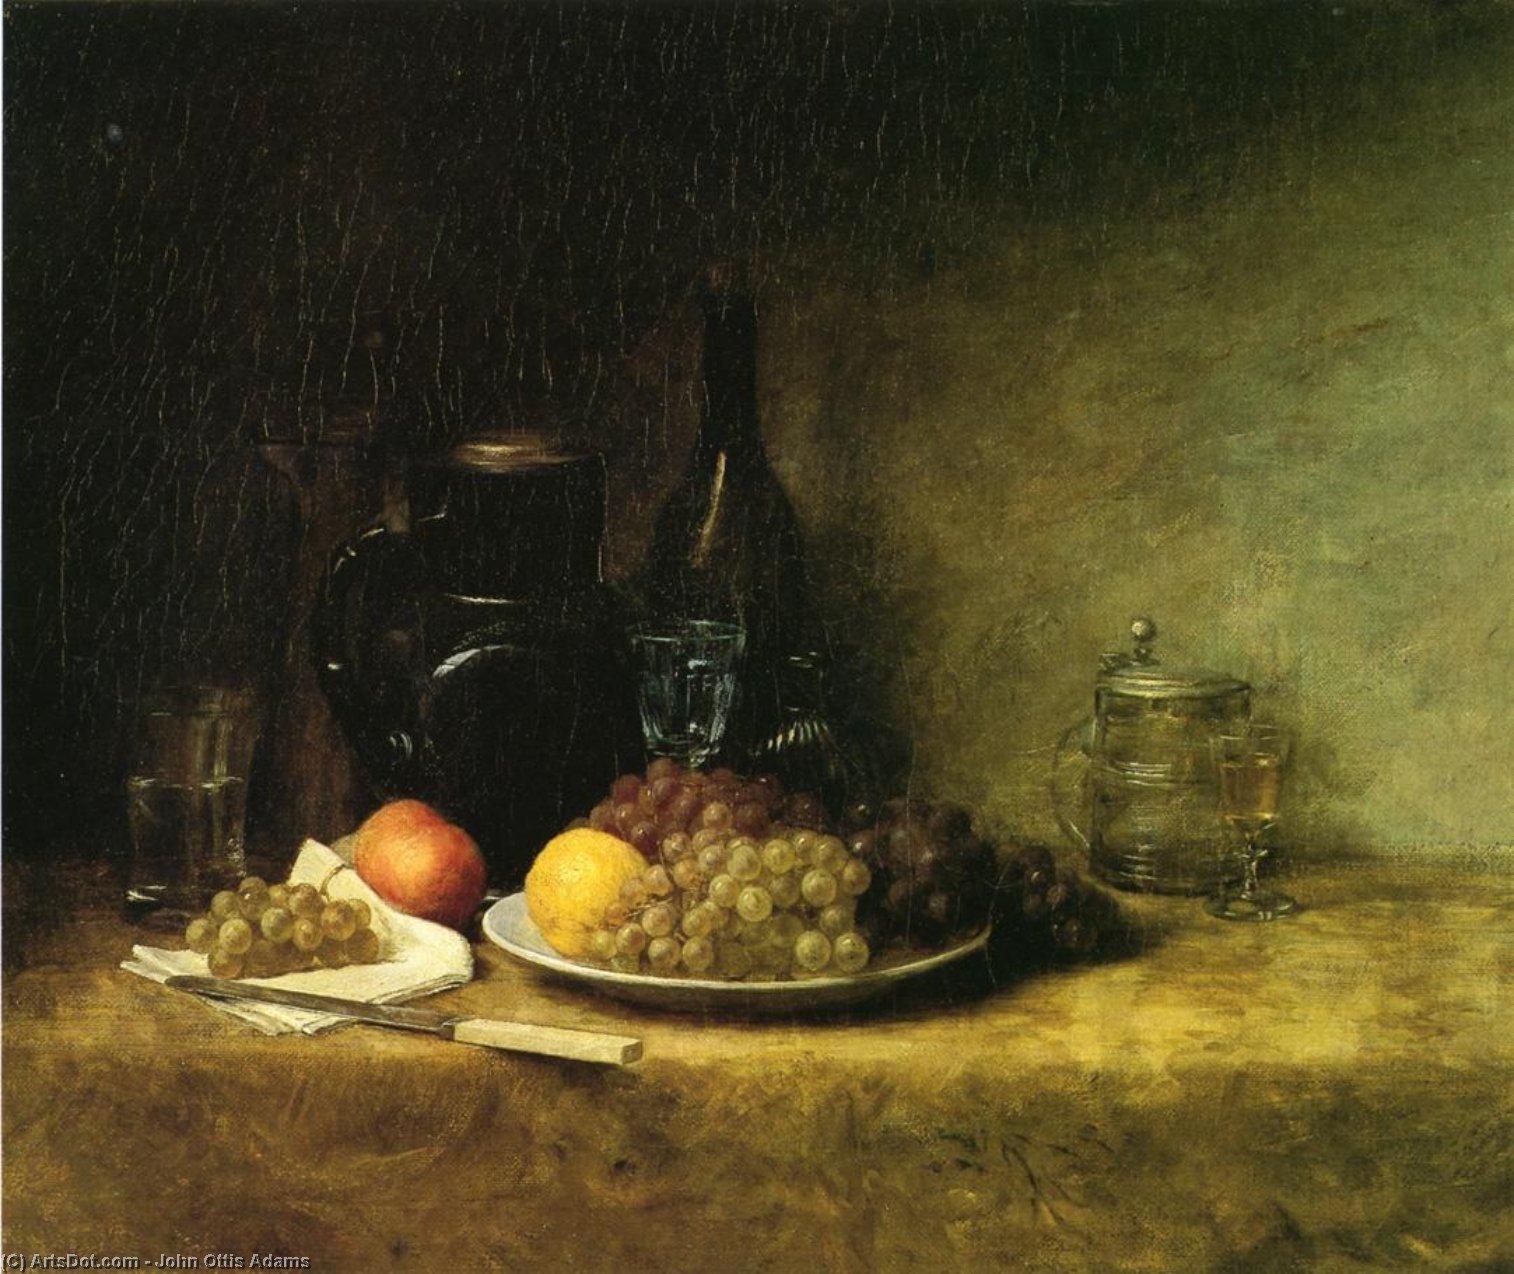 Wikioo.org - The Encyclopedia of Fine Arts - Painting, Artwork by John Ottis Adams - Still Life